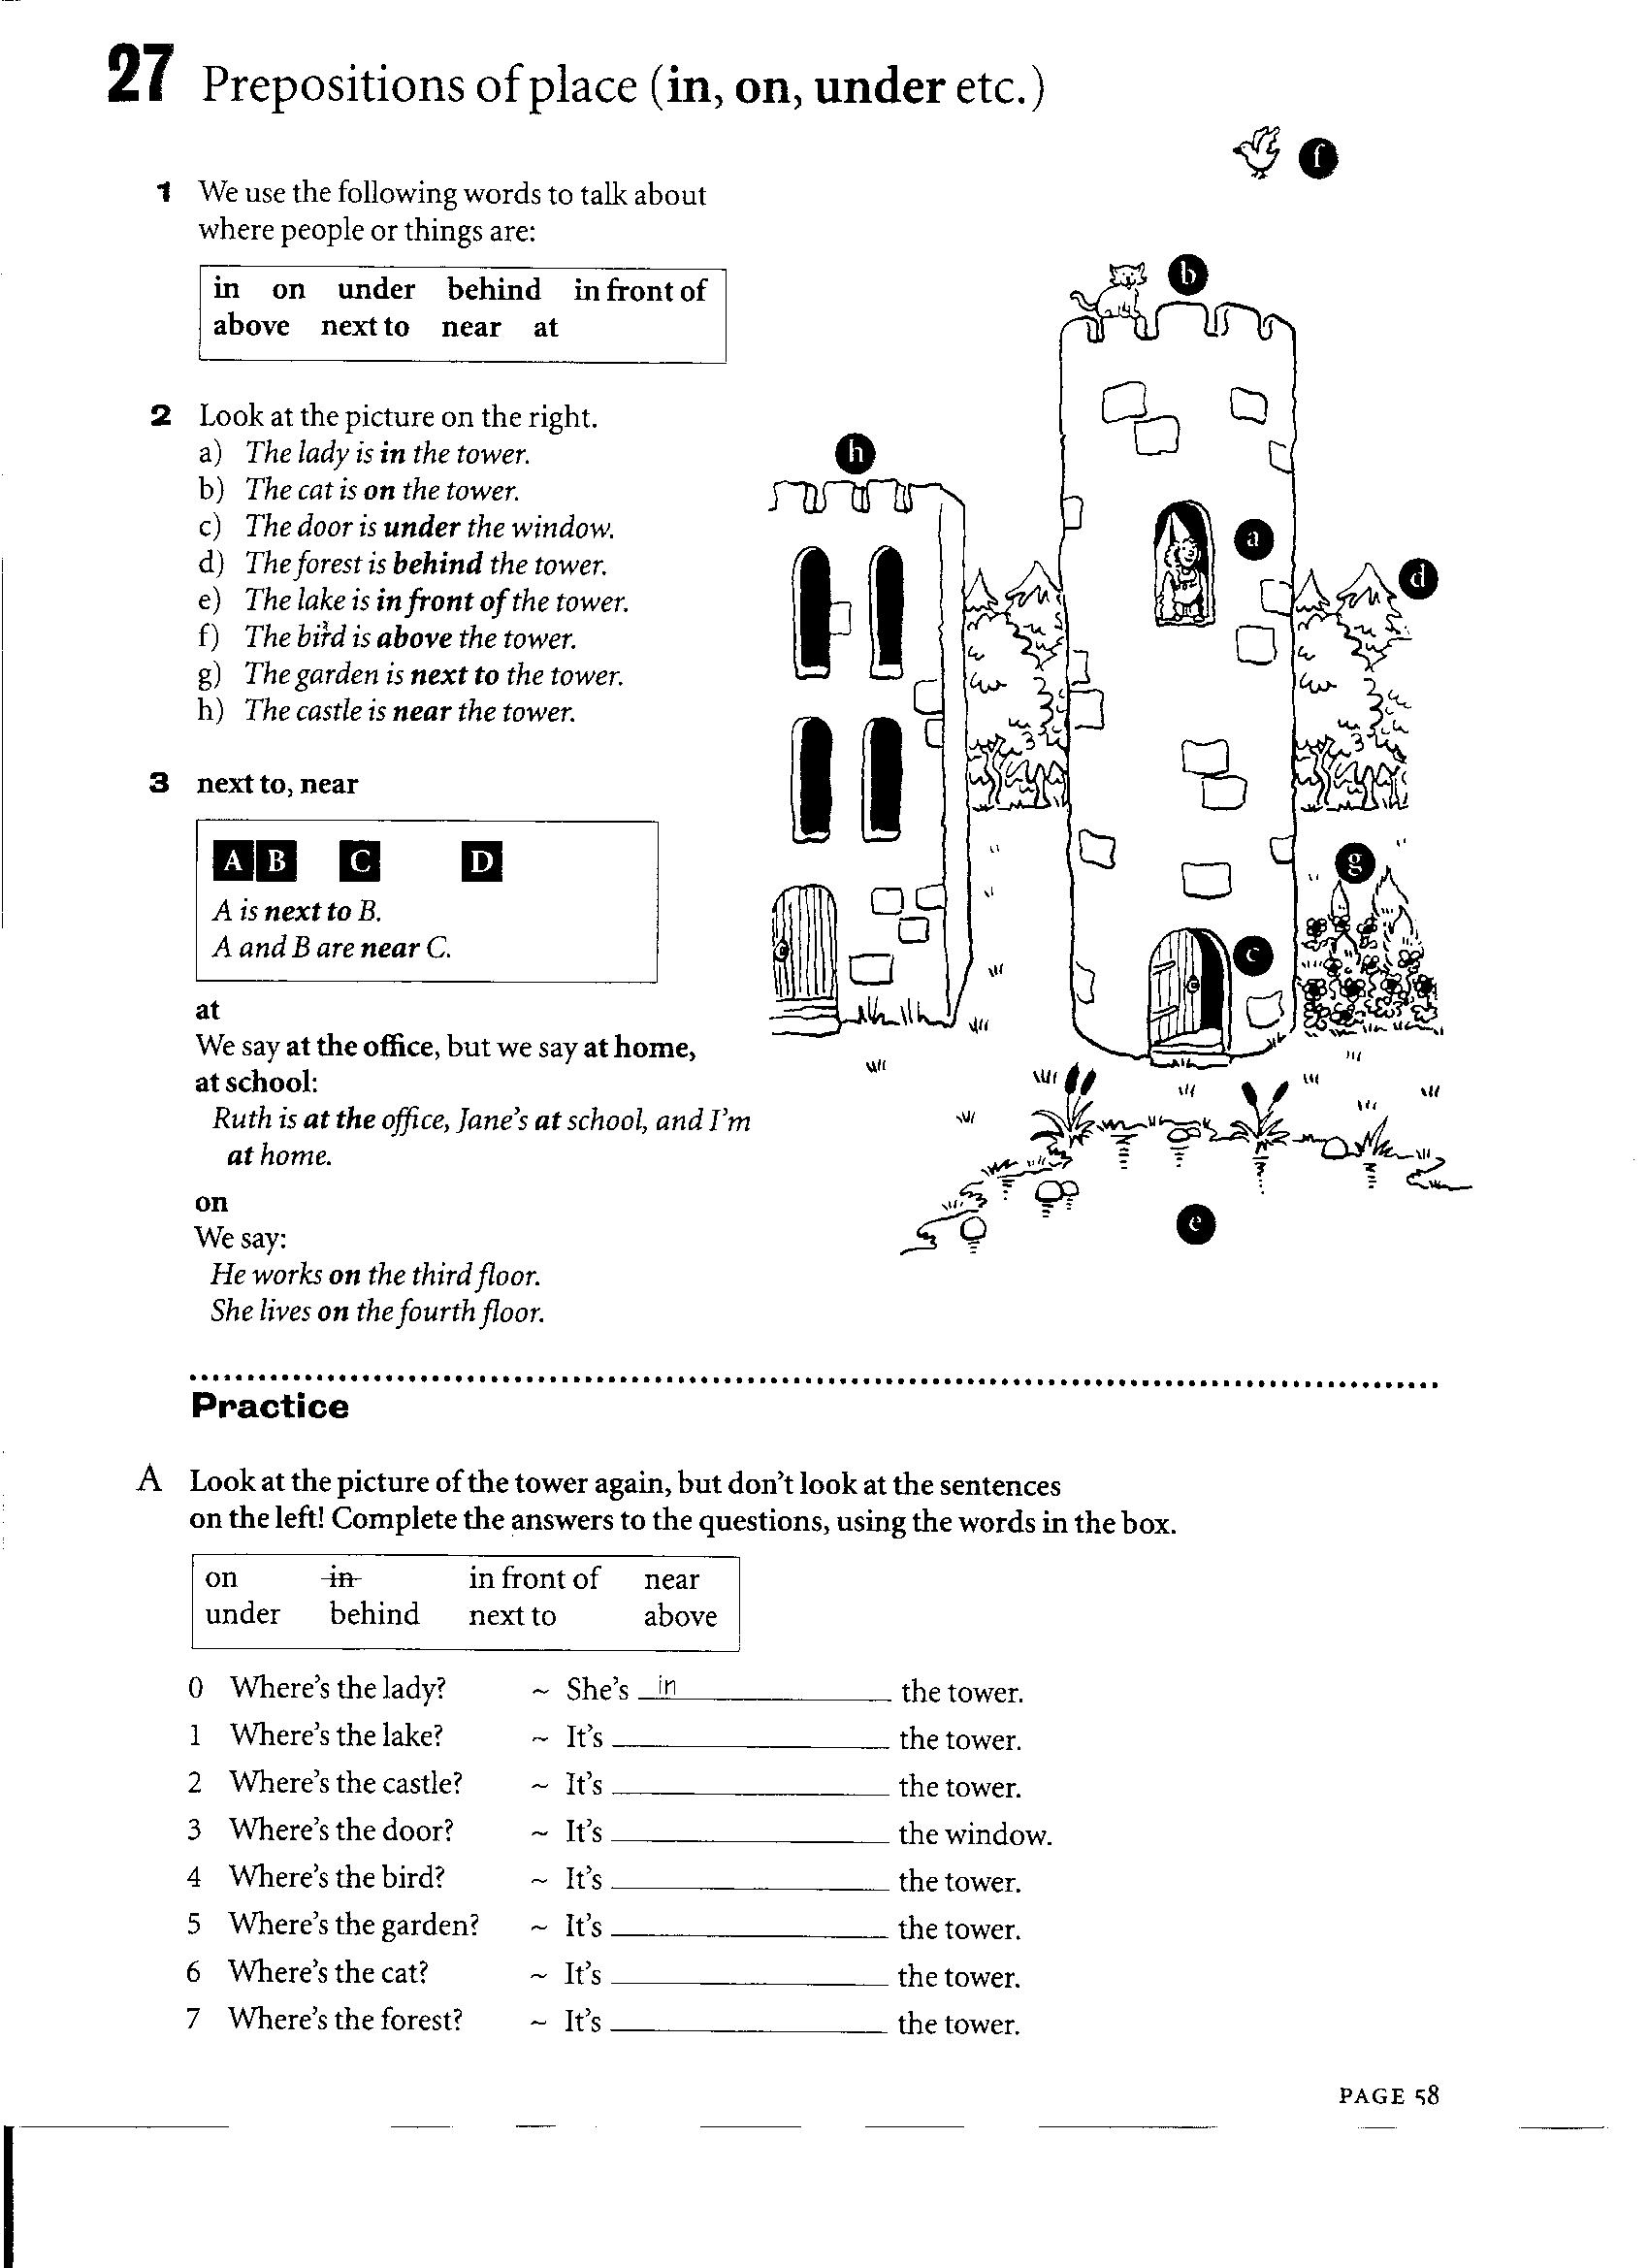 14 Best Images Of Esl Prepositions Of Place Worksheets